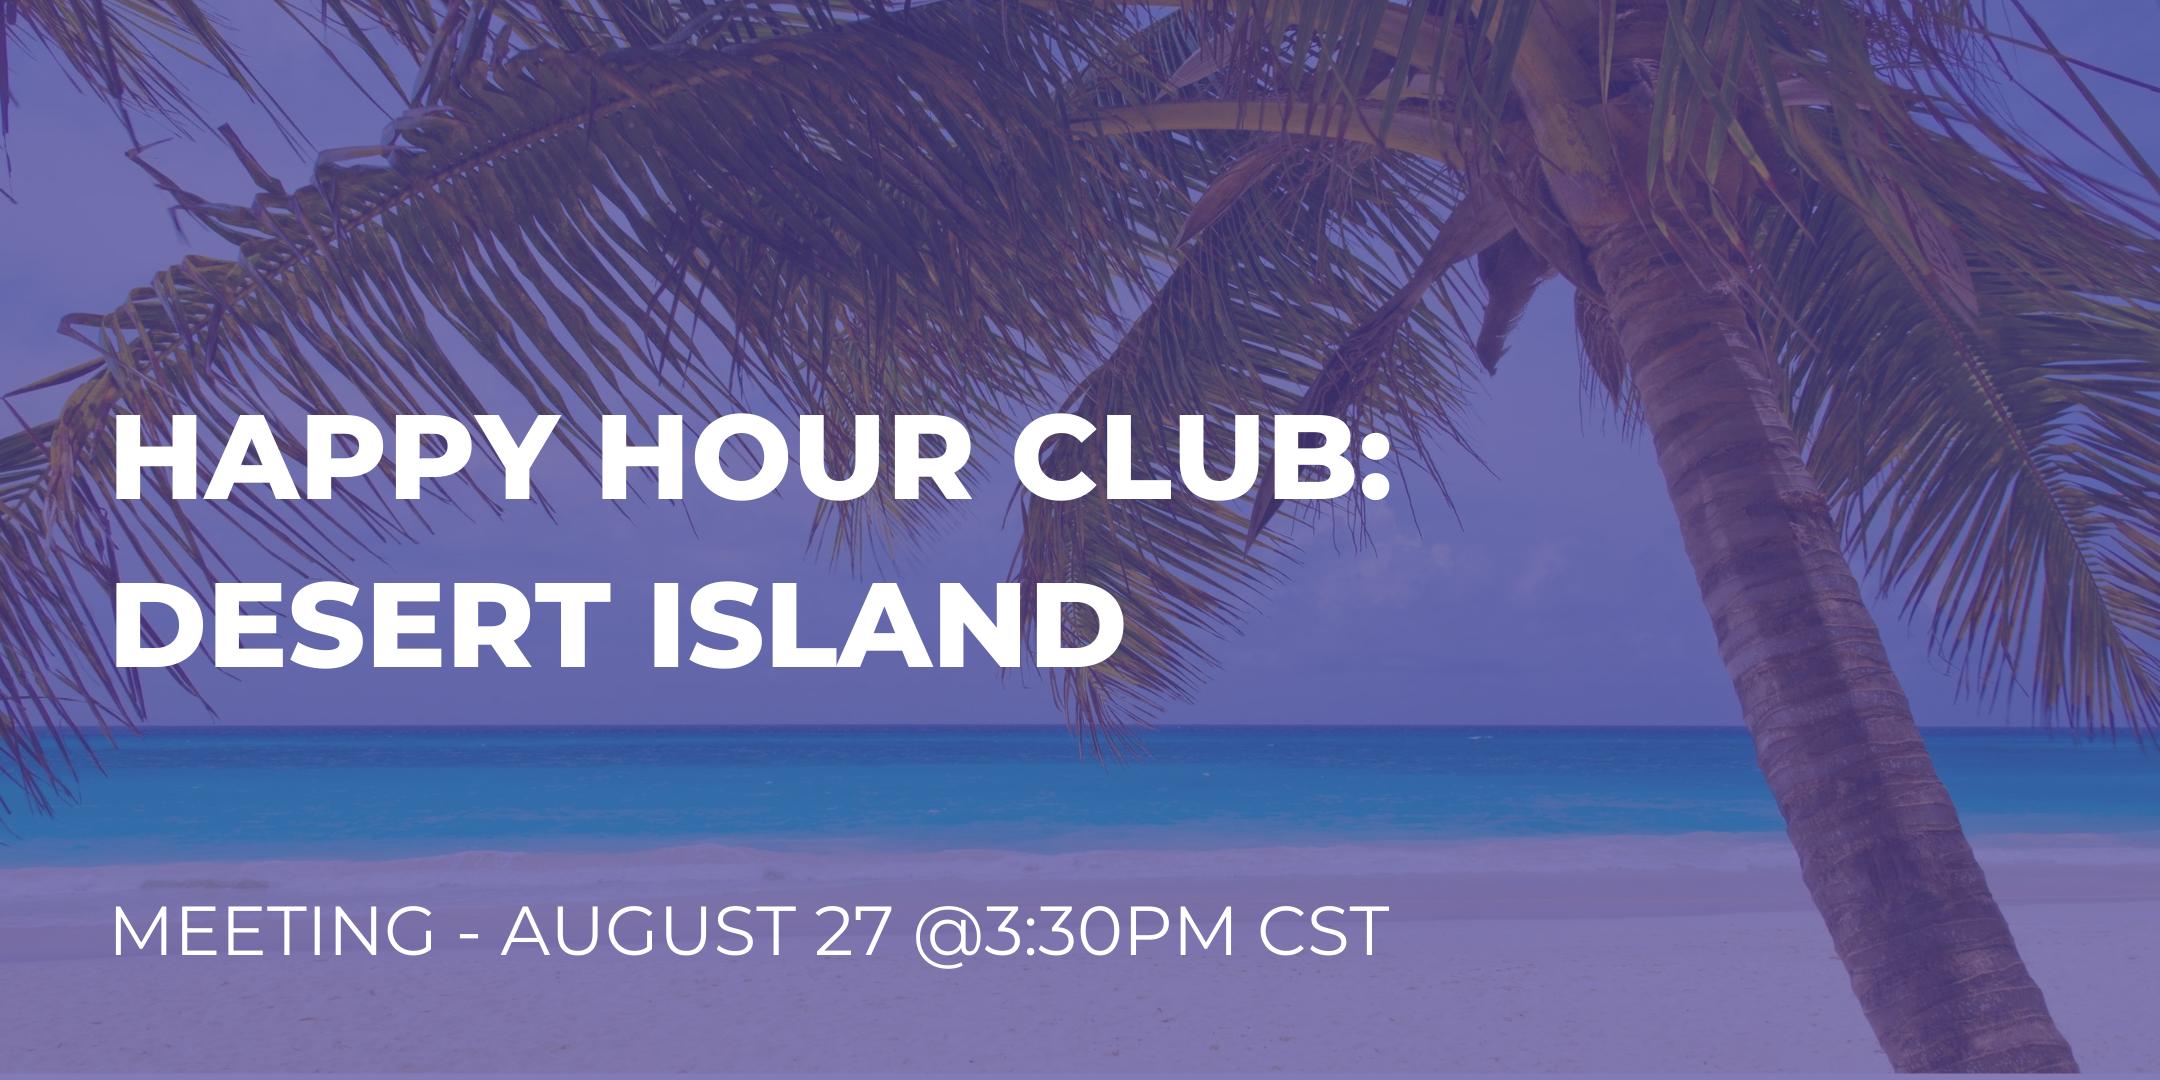 Happy-Hour-Club-Desert-Island